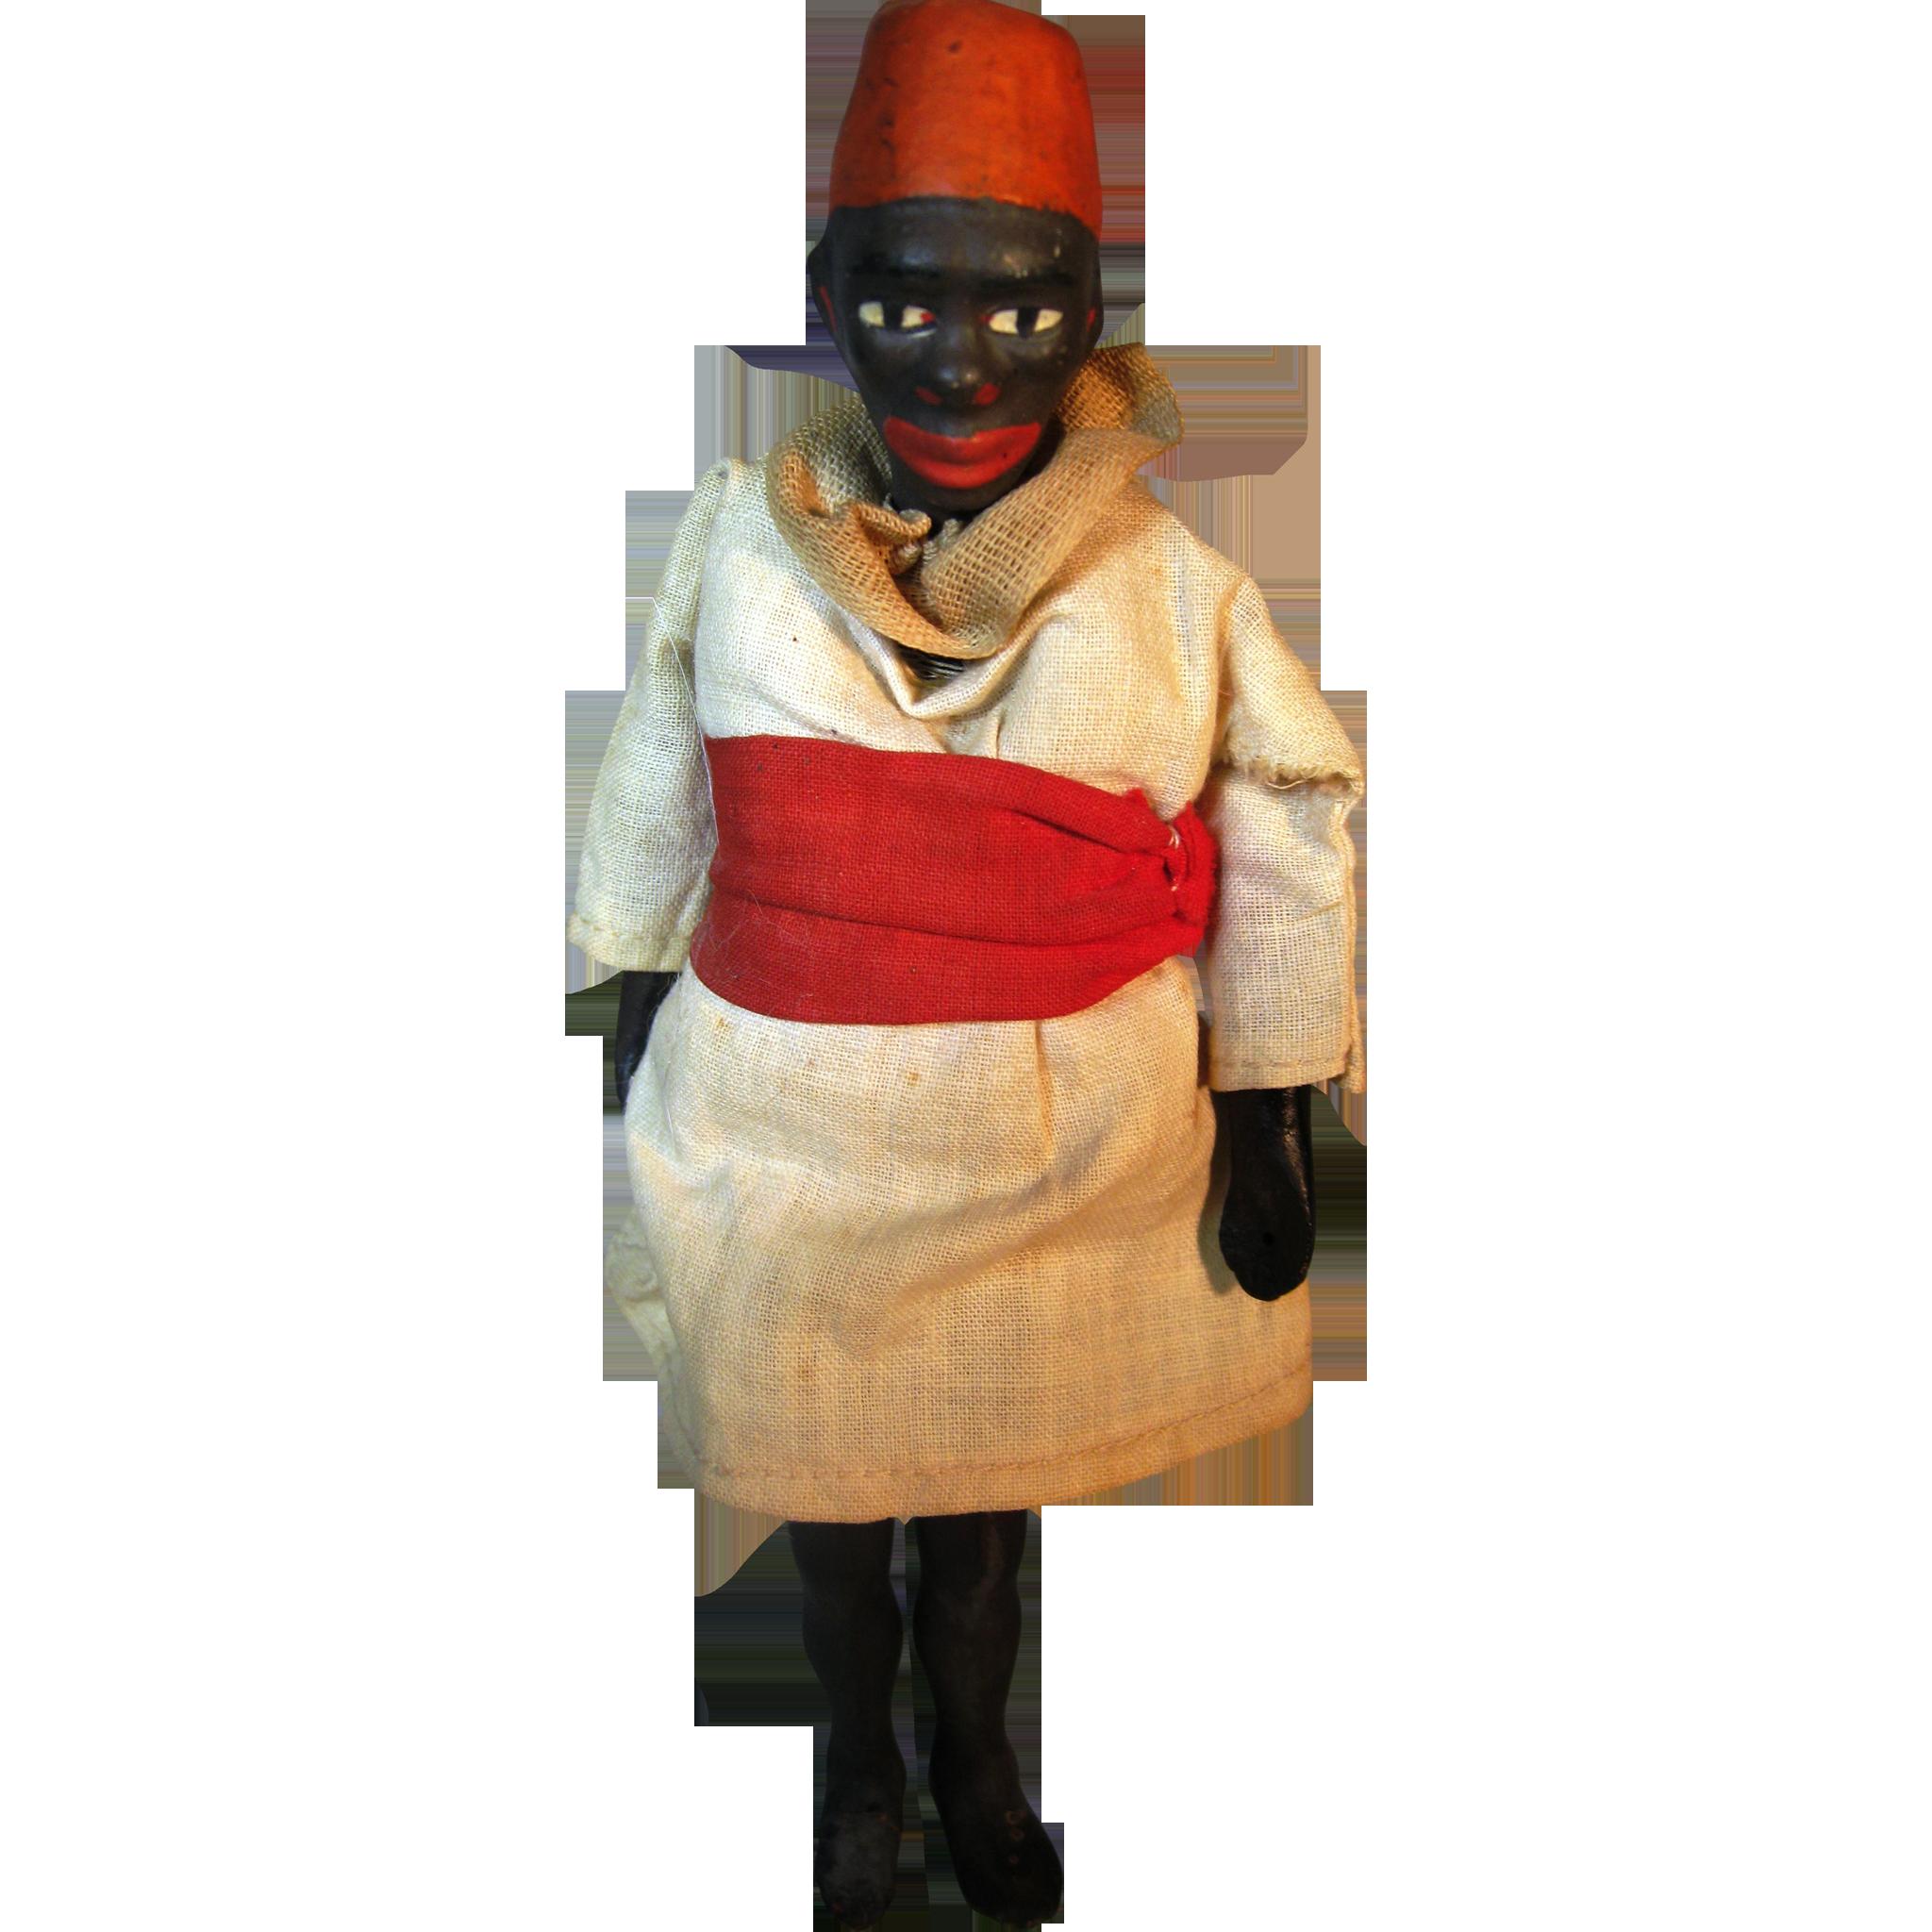 Antique Ethnic Black Americana African Puppet Minstrel